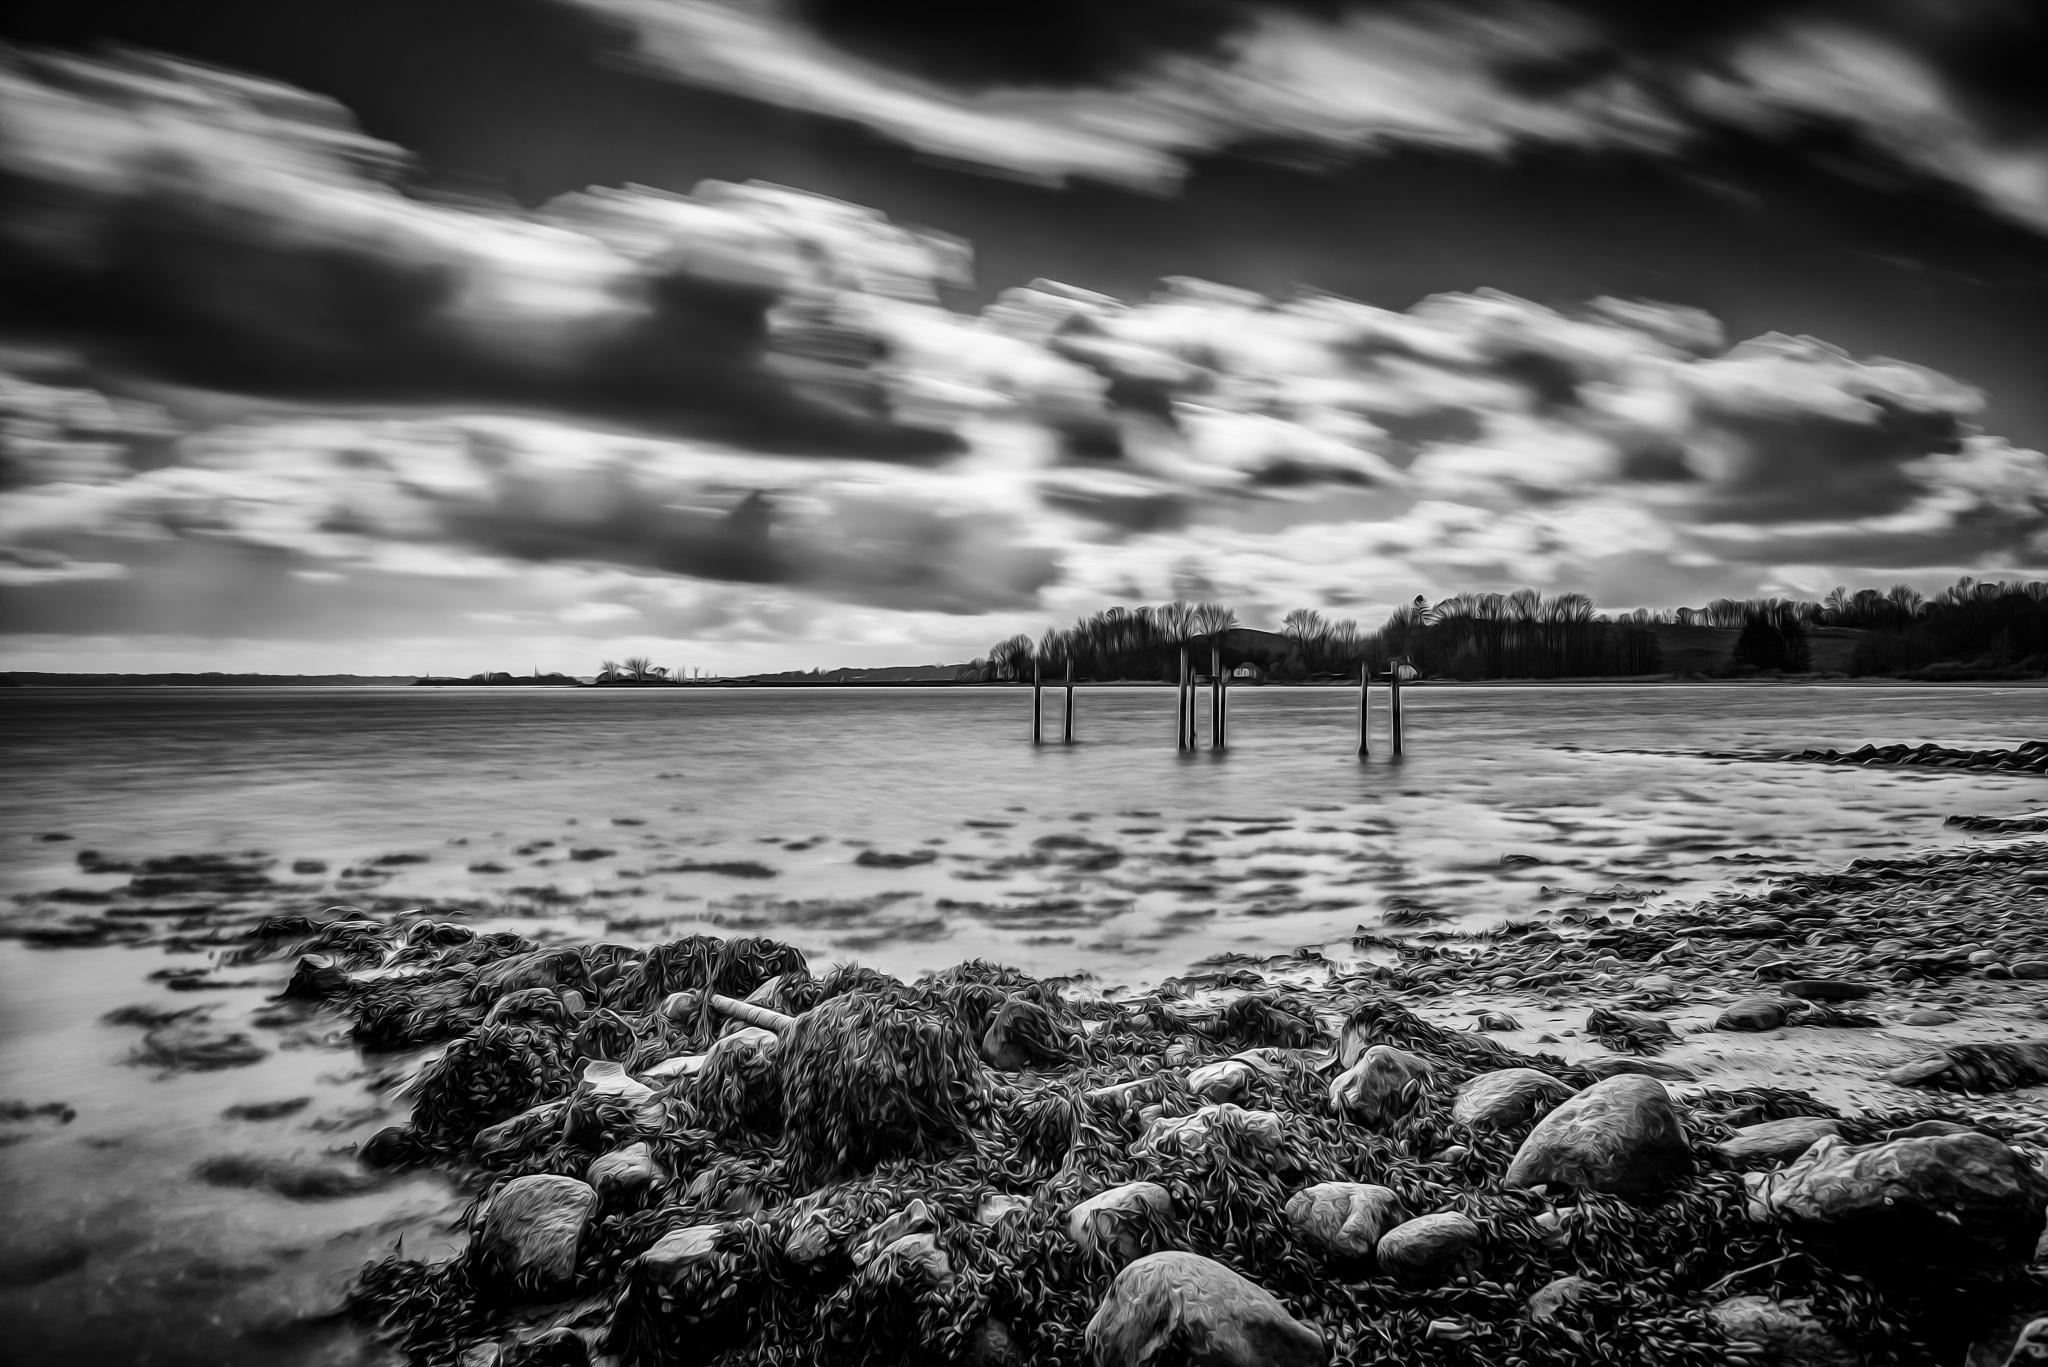 Silent Rush by Mikkel